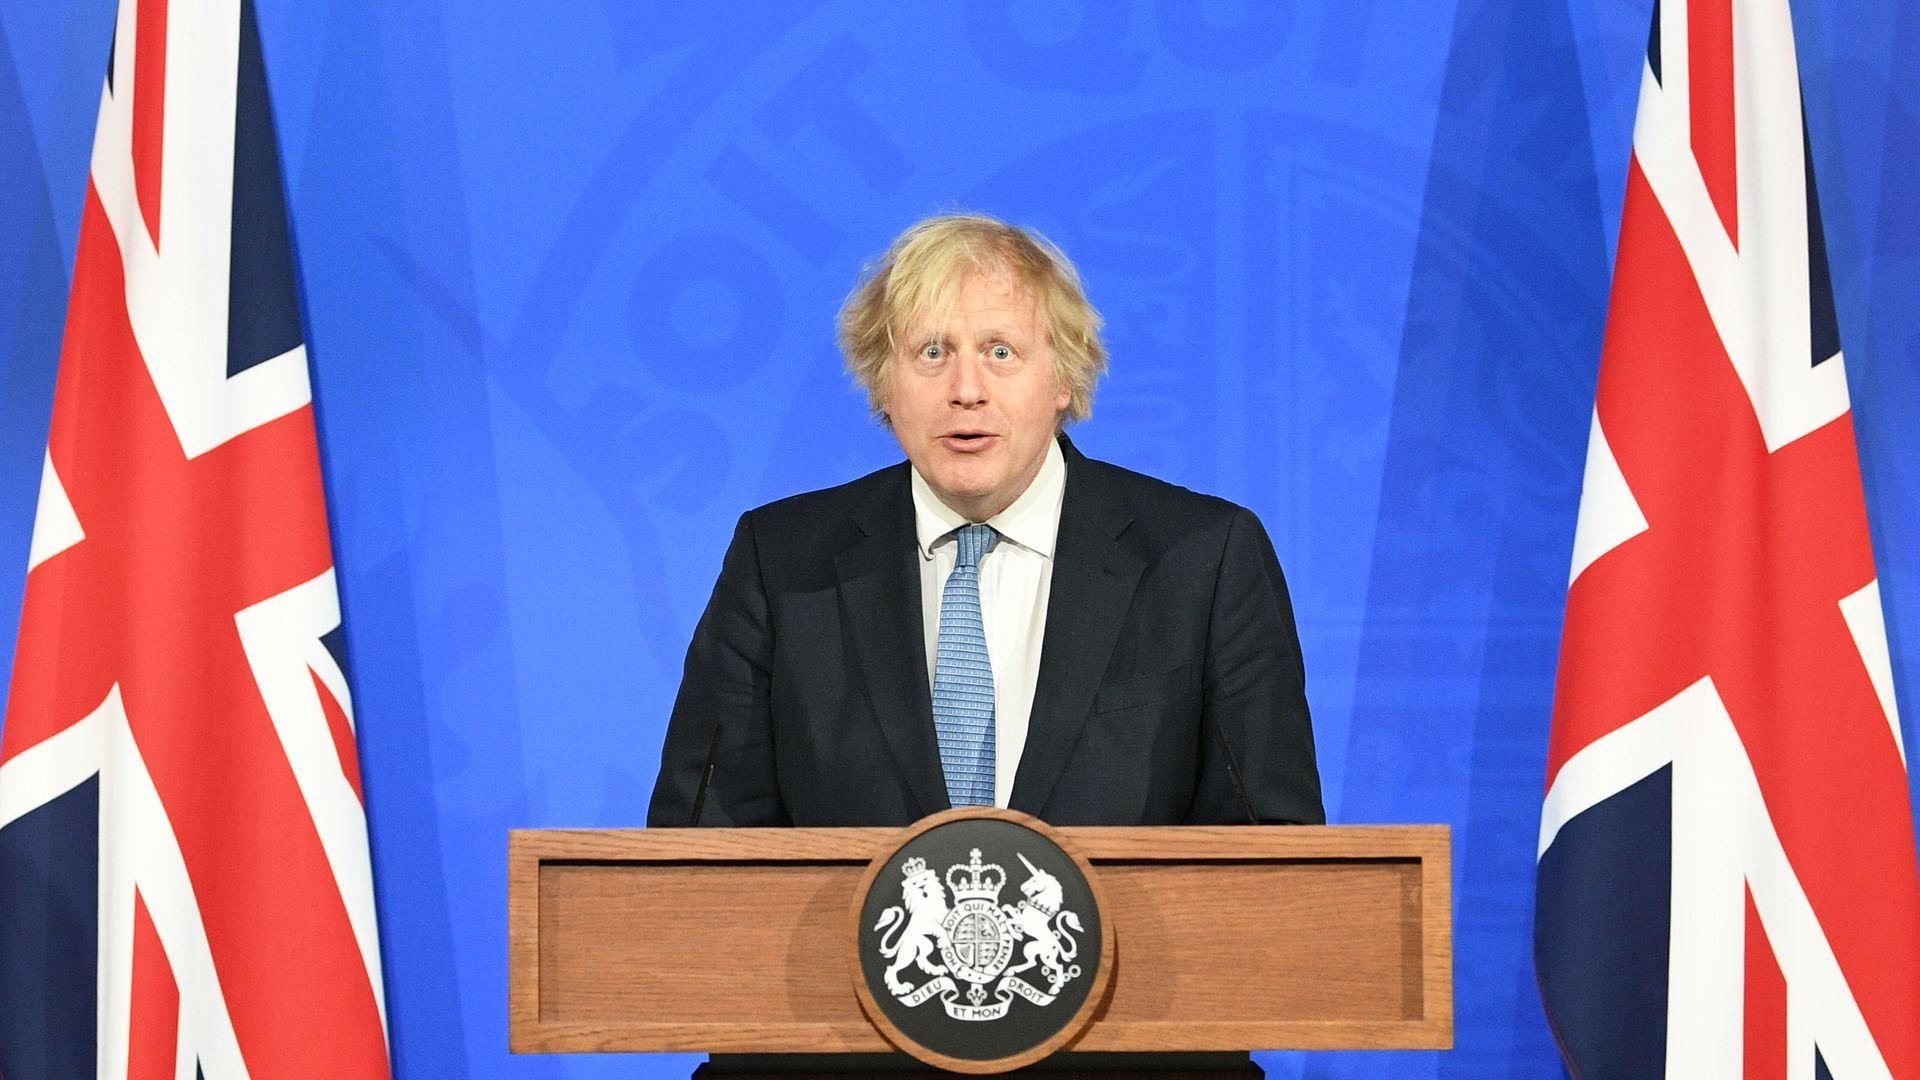 Prime minister Boris Johnson during a coronavirus press briefing broadcast on TV - Credit: PA